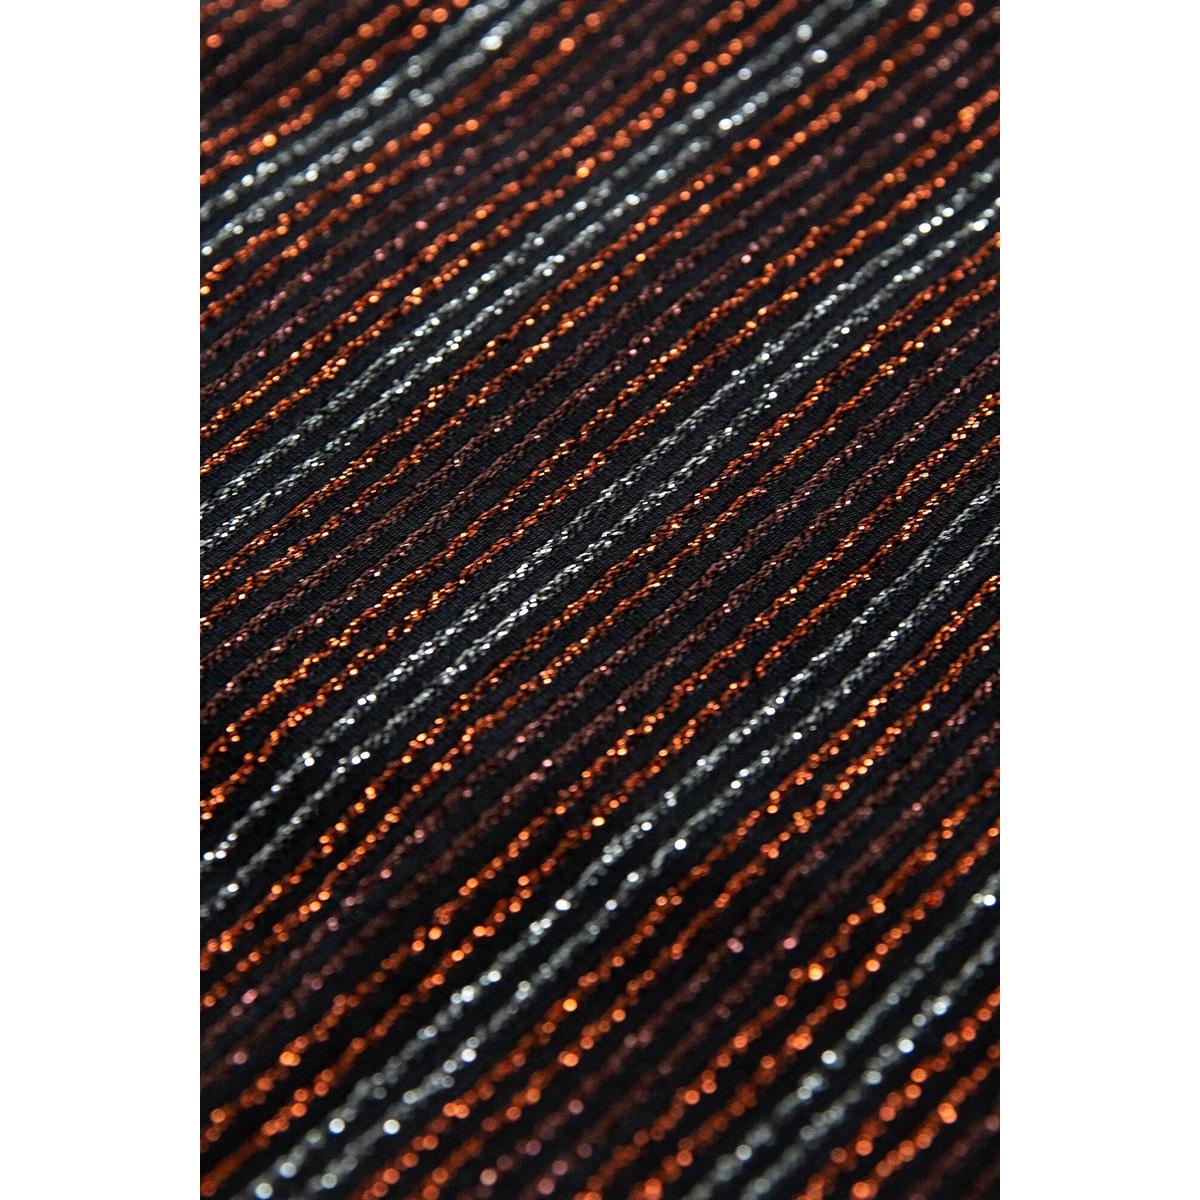 glittertop k90001 garcia t-shirt 60 black